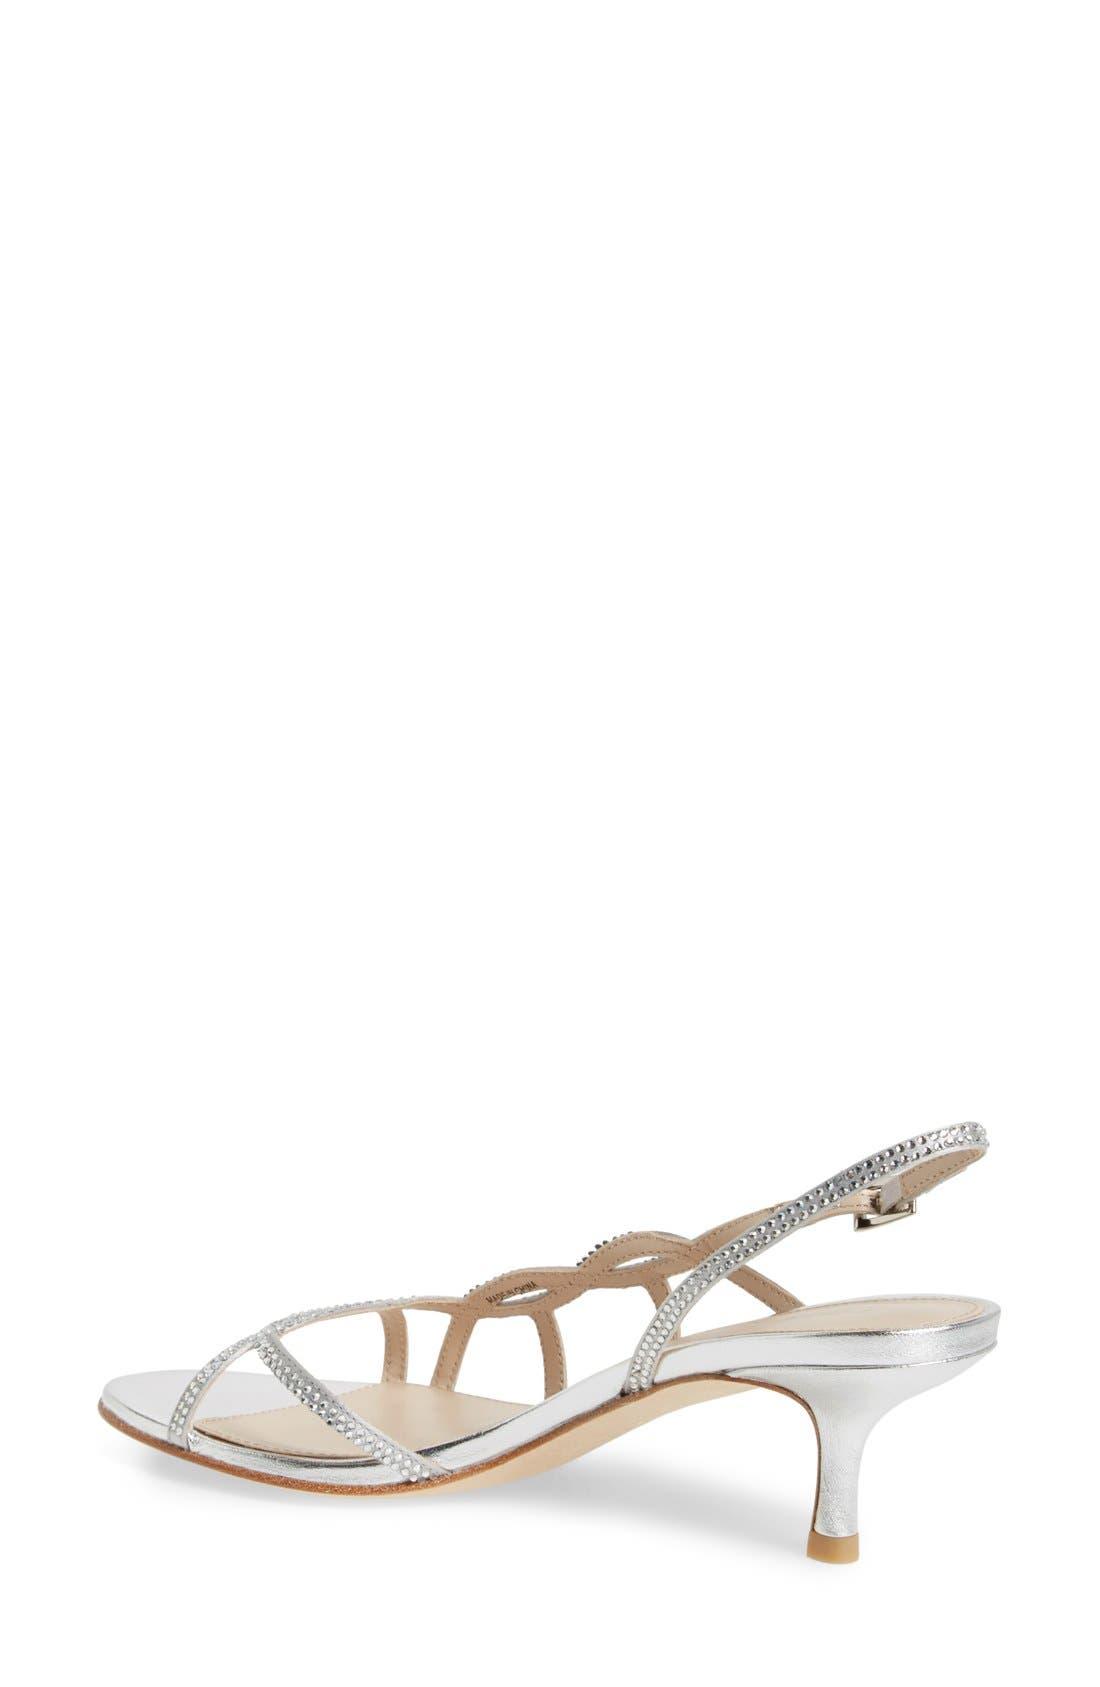 Alternate Image 2  - Pelle Moda 'Amina' Metallic Slingback Sandal (Women)